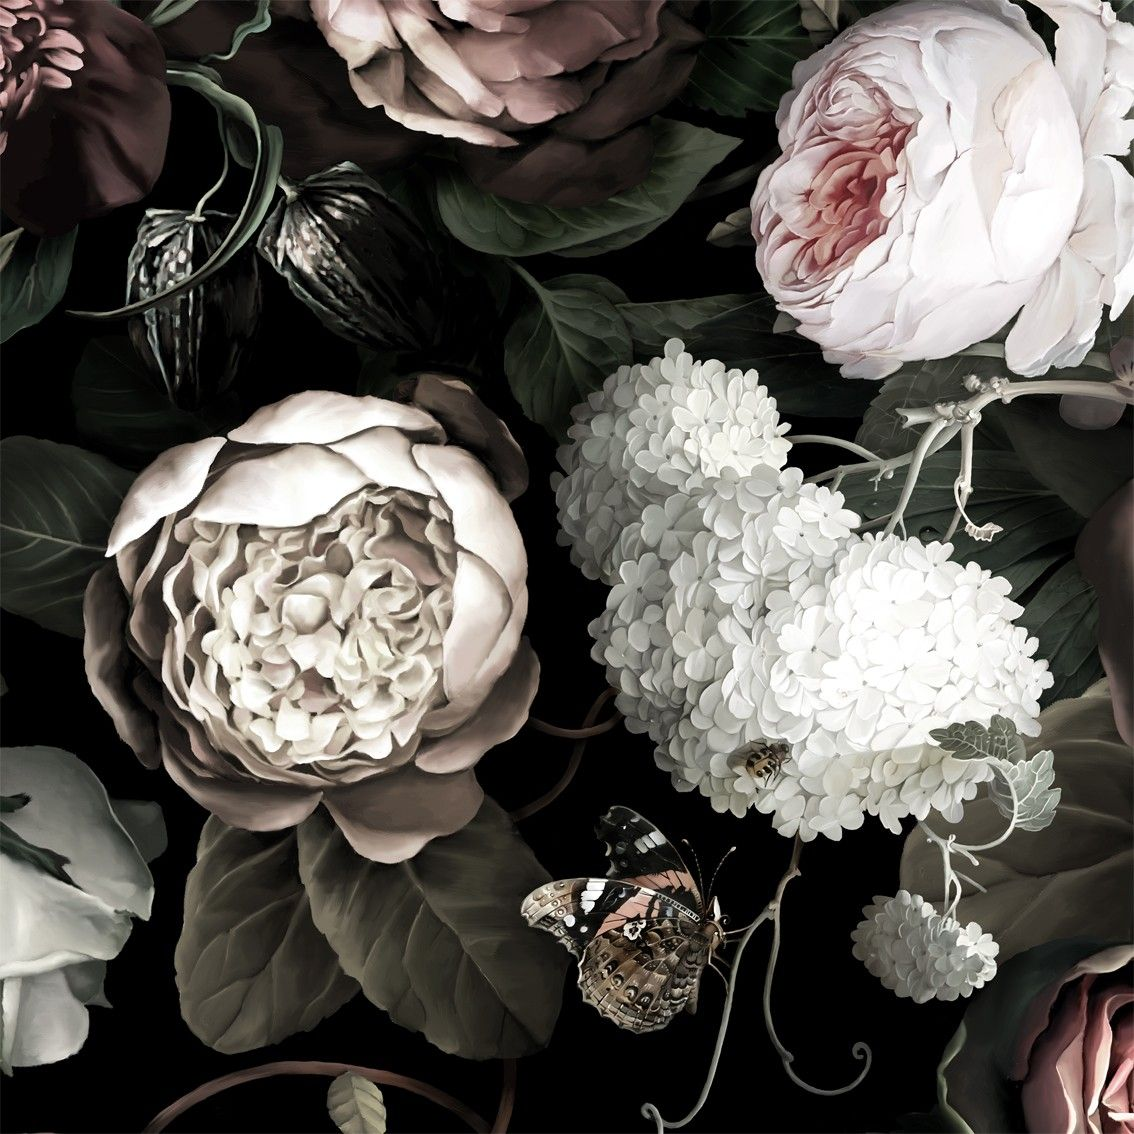 Dark floral ii black saturated floral wallpaper by ellie cashman design